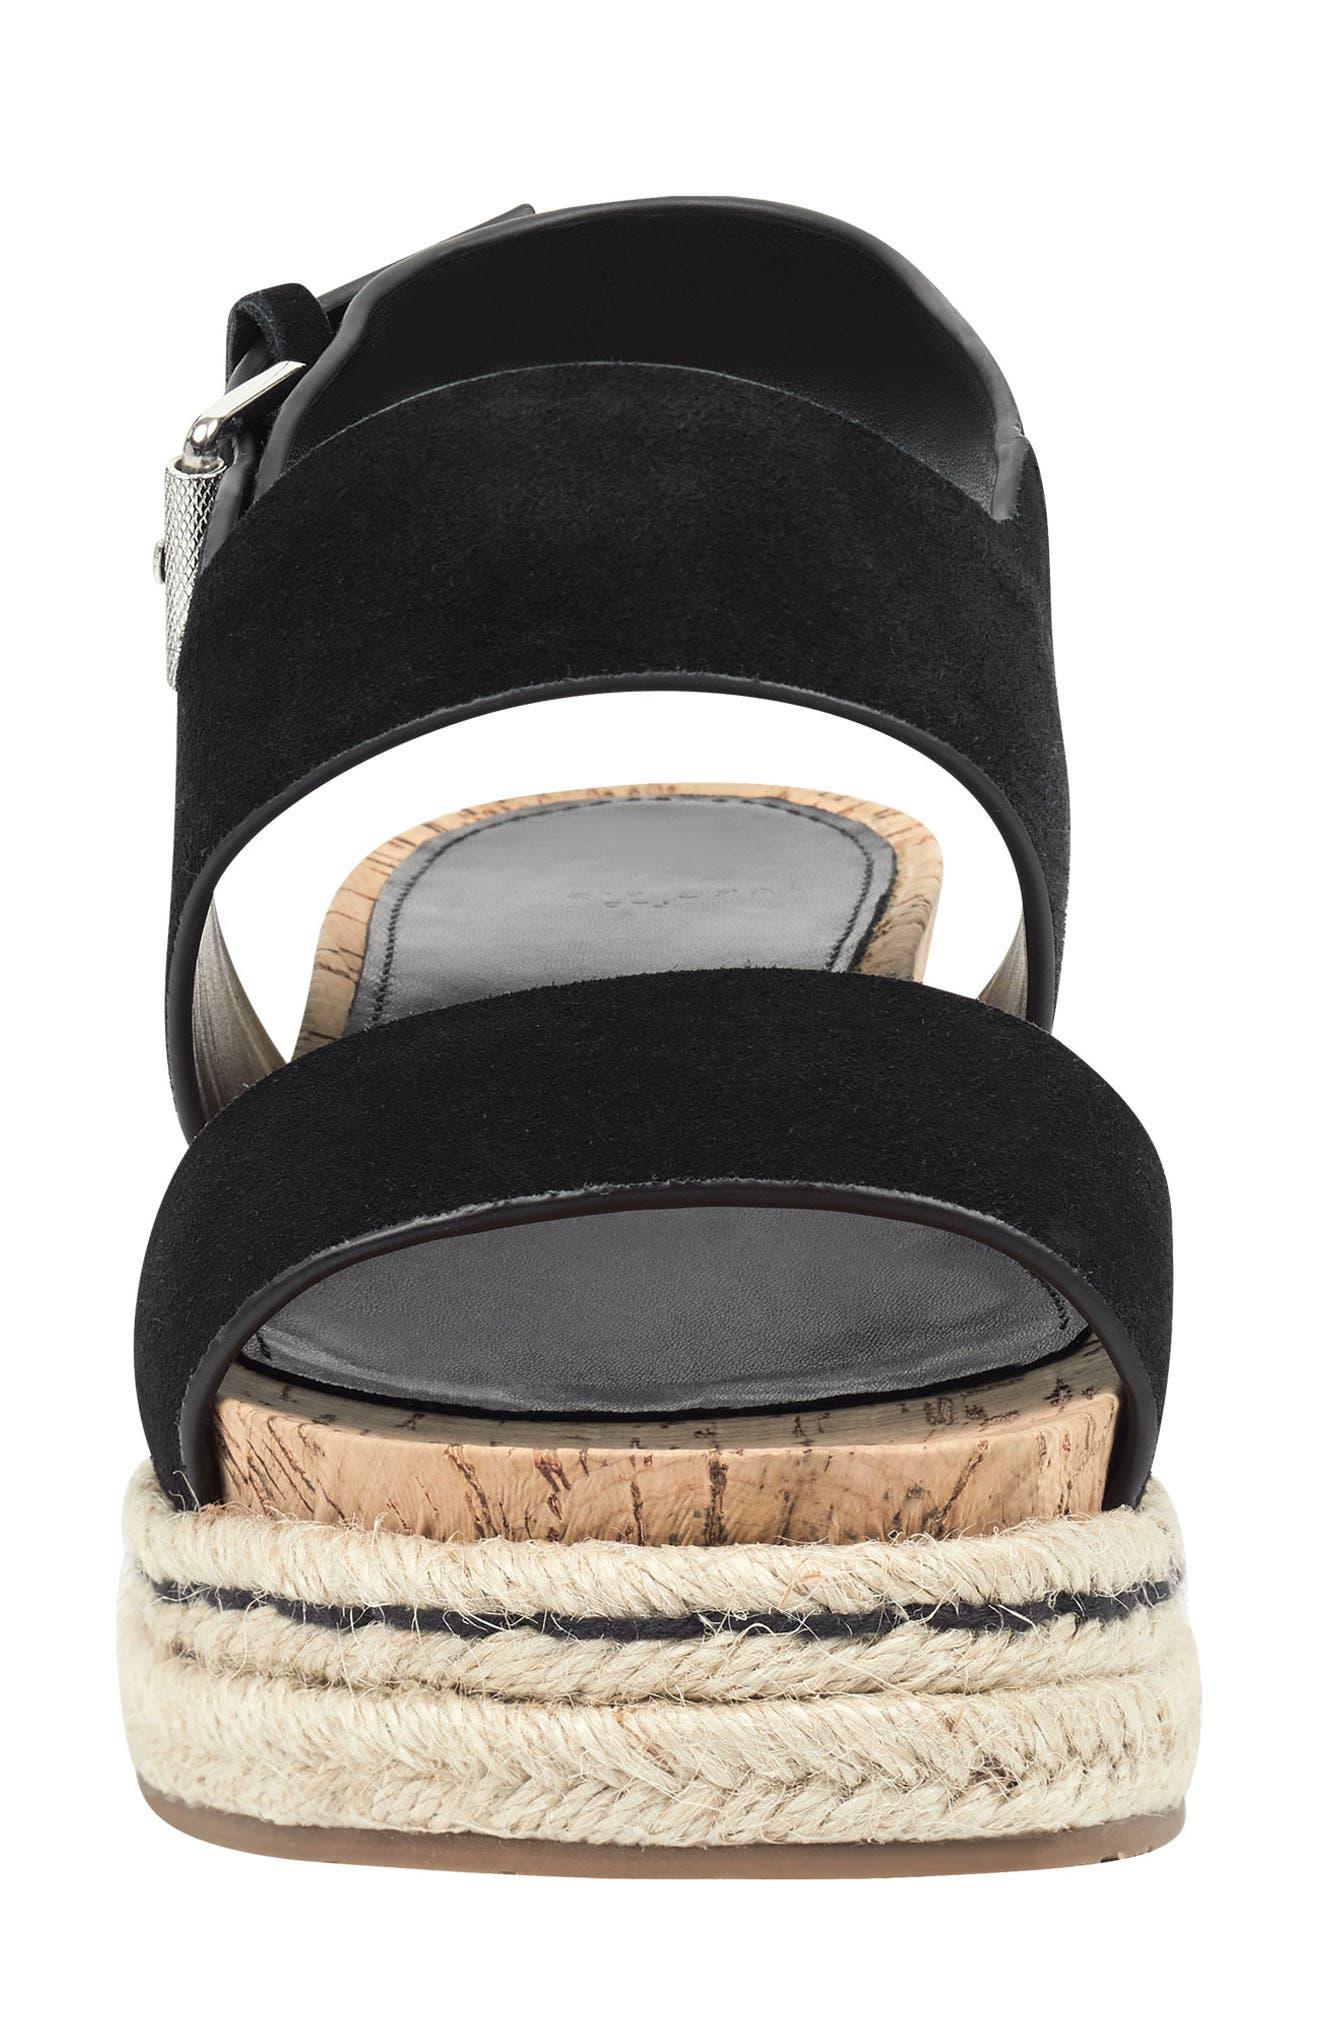 MARC FISHER LTD, Oria Espadrille Platform Sandal, Alternate thumbnail 4, color, BLACK SUEDE